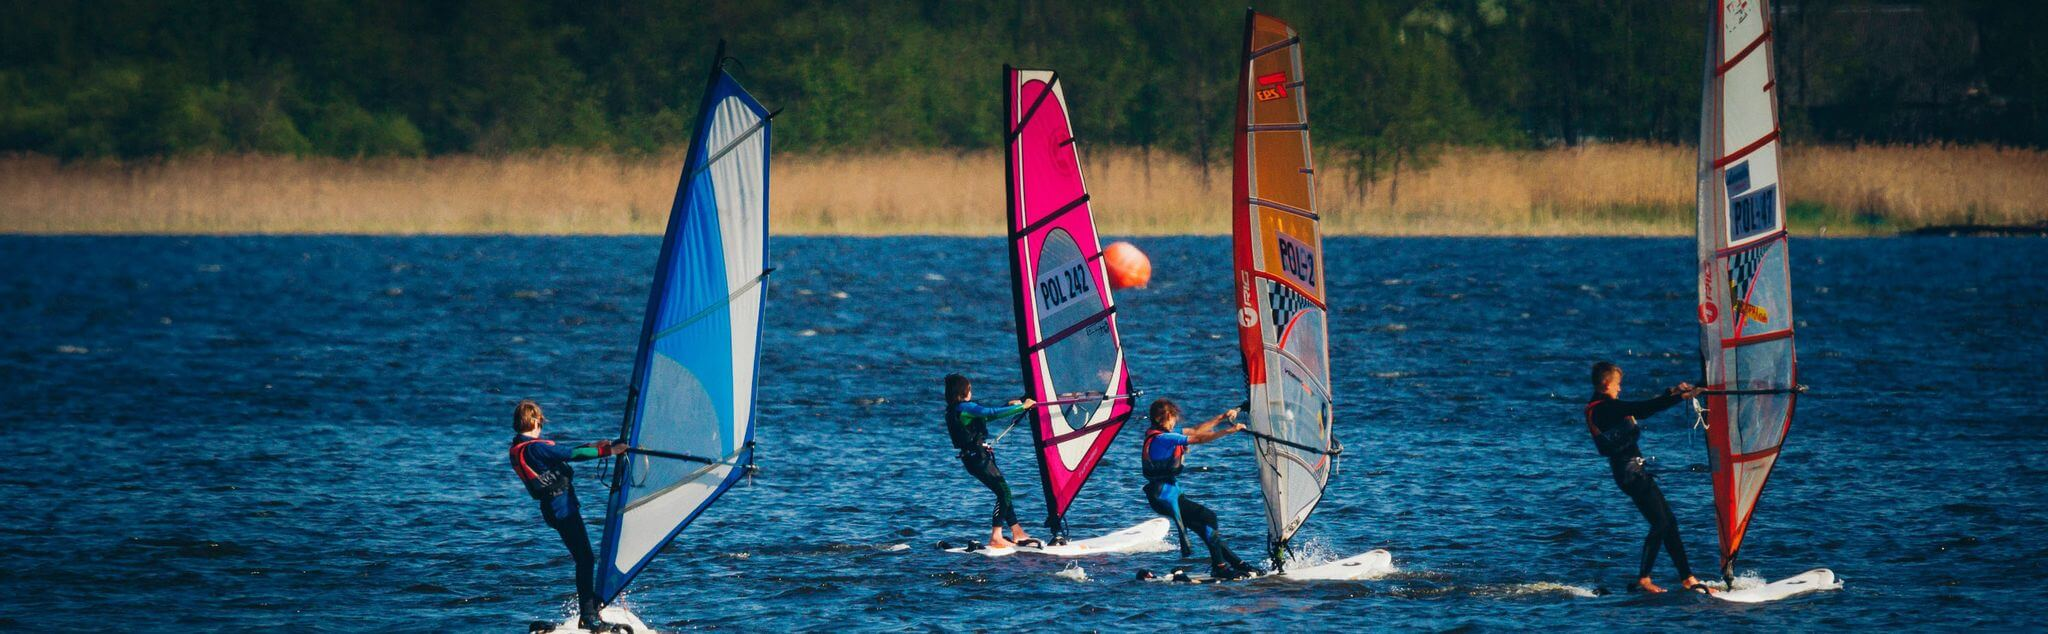 Windsurf dans Bouches-du-Rhône